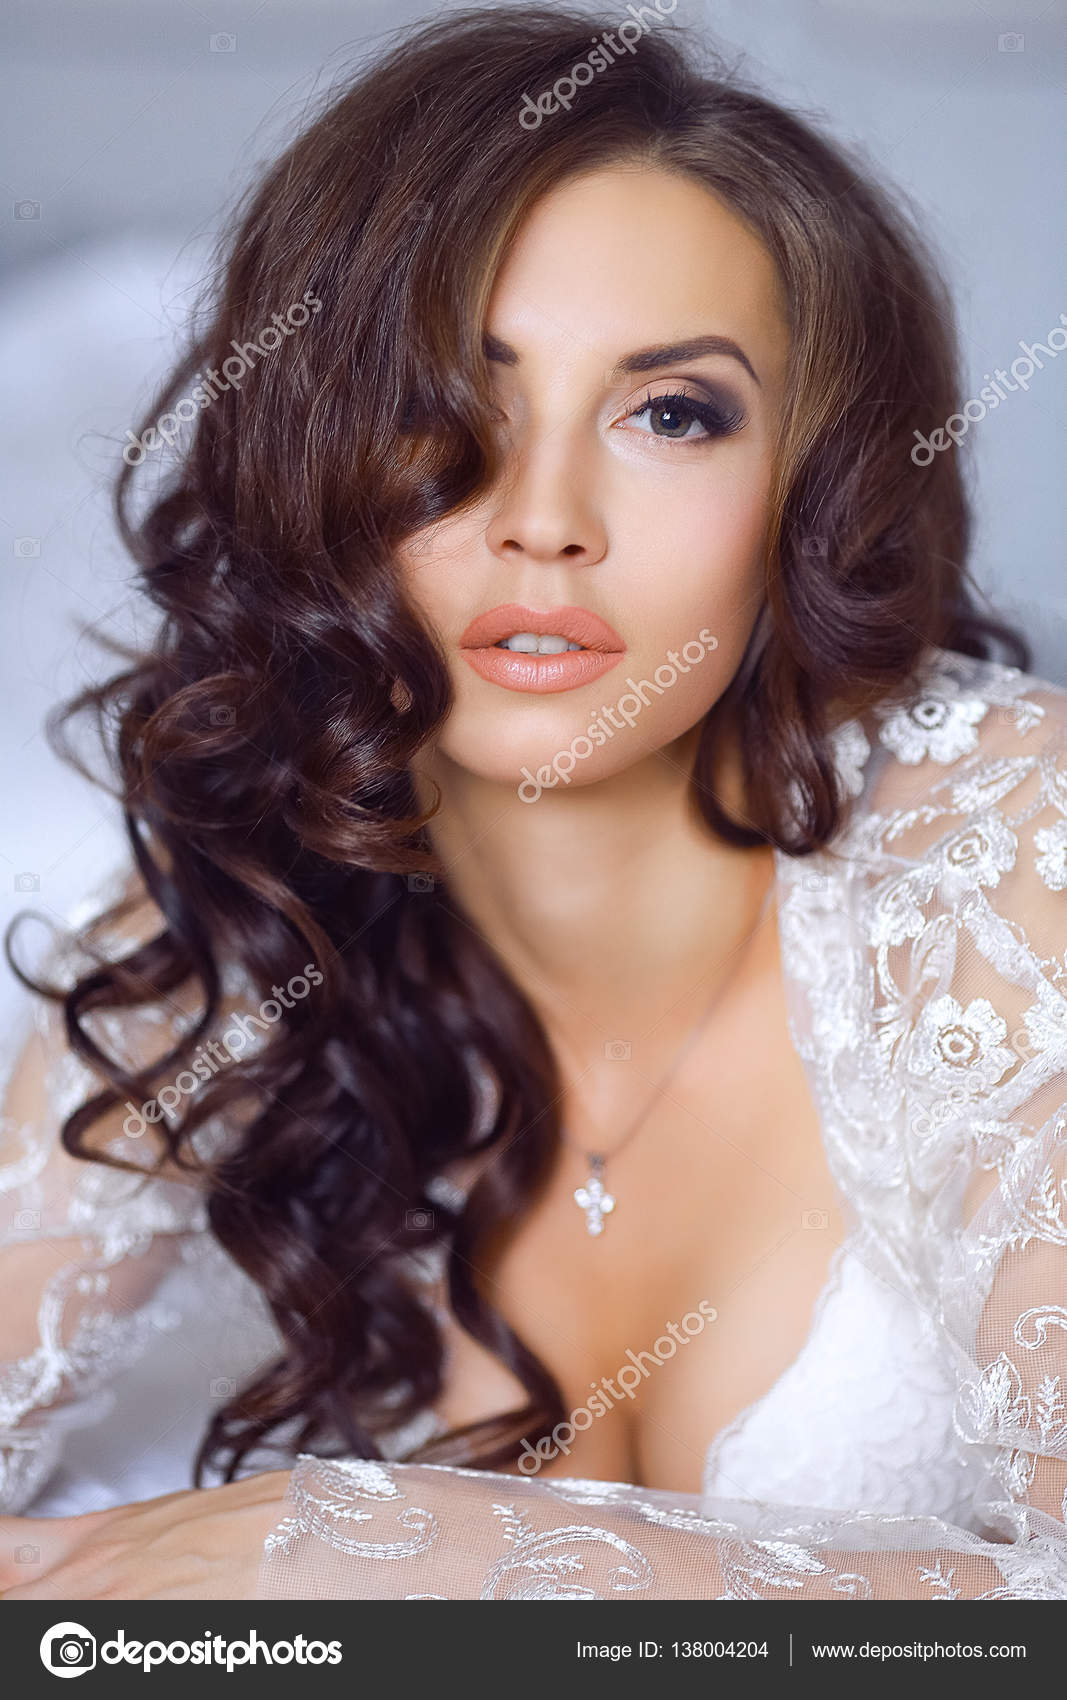 b96c70d2c15 Κοντινό πλάνο με πορτρέτο του όμορφη νύφη. Το πρωί της νύφης. Πρωί ...